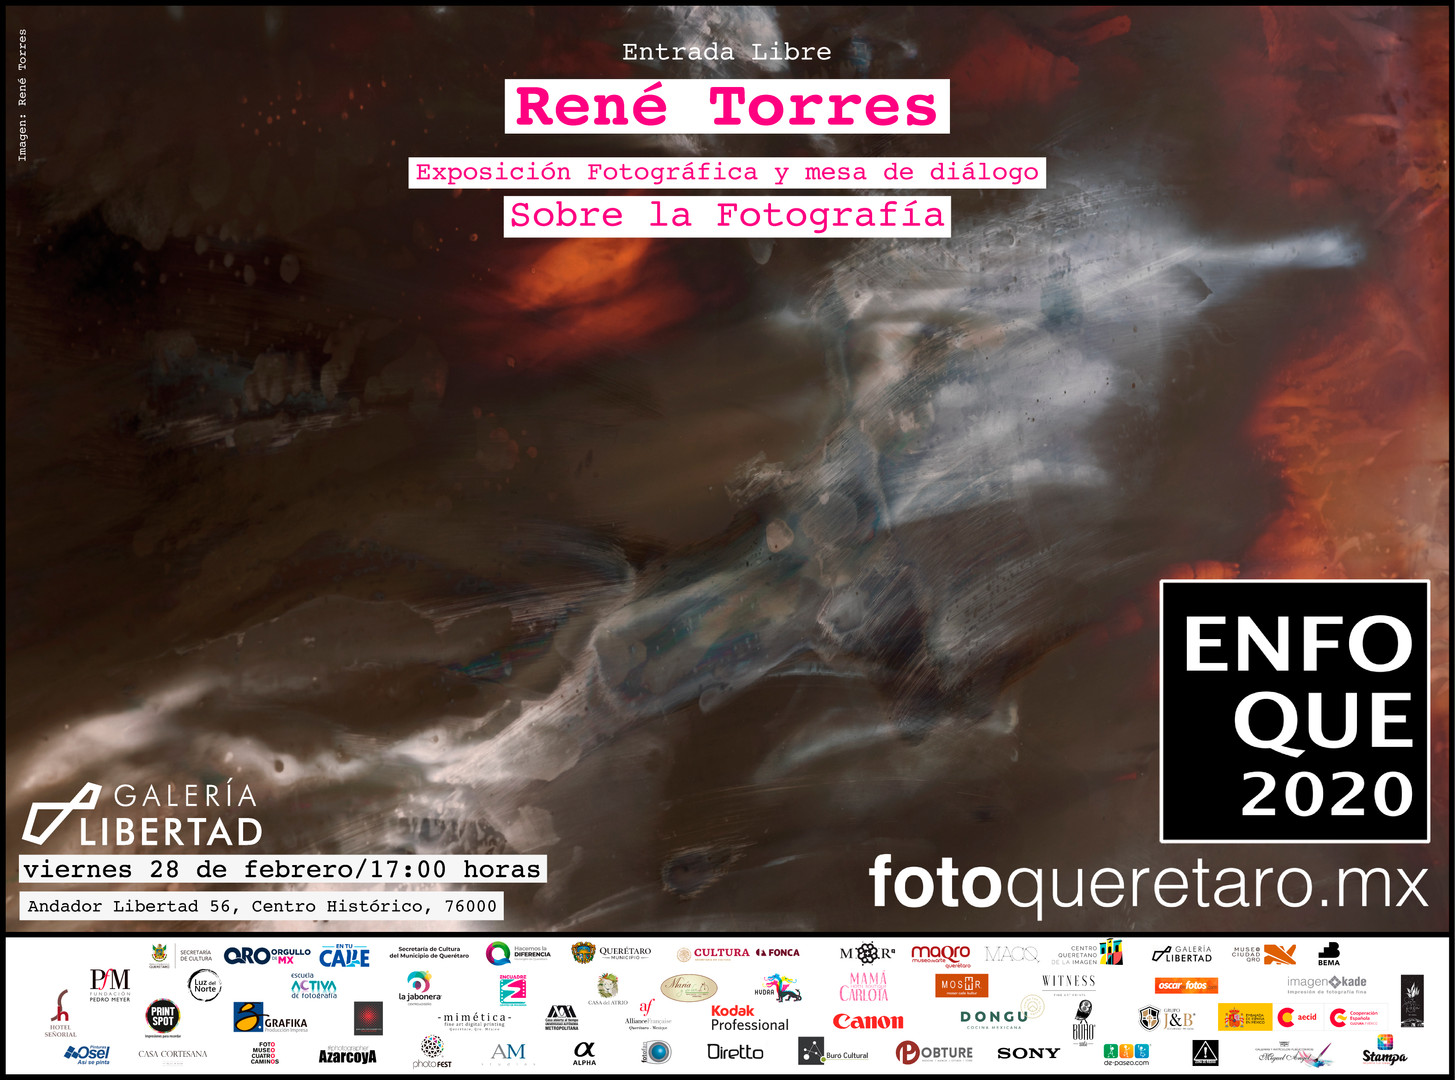 René Torres